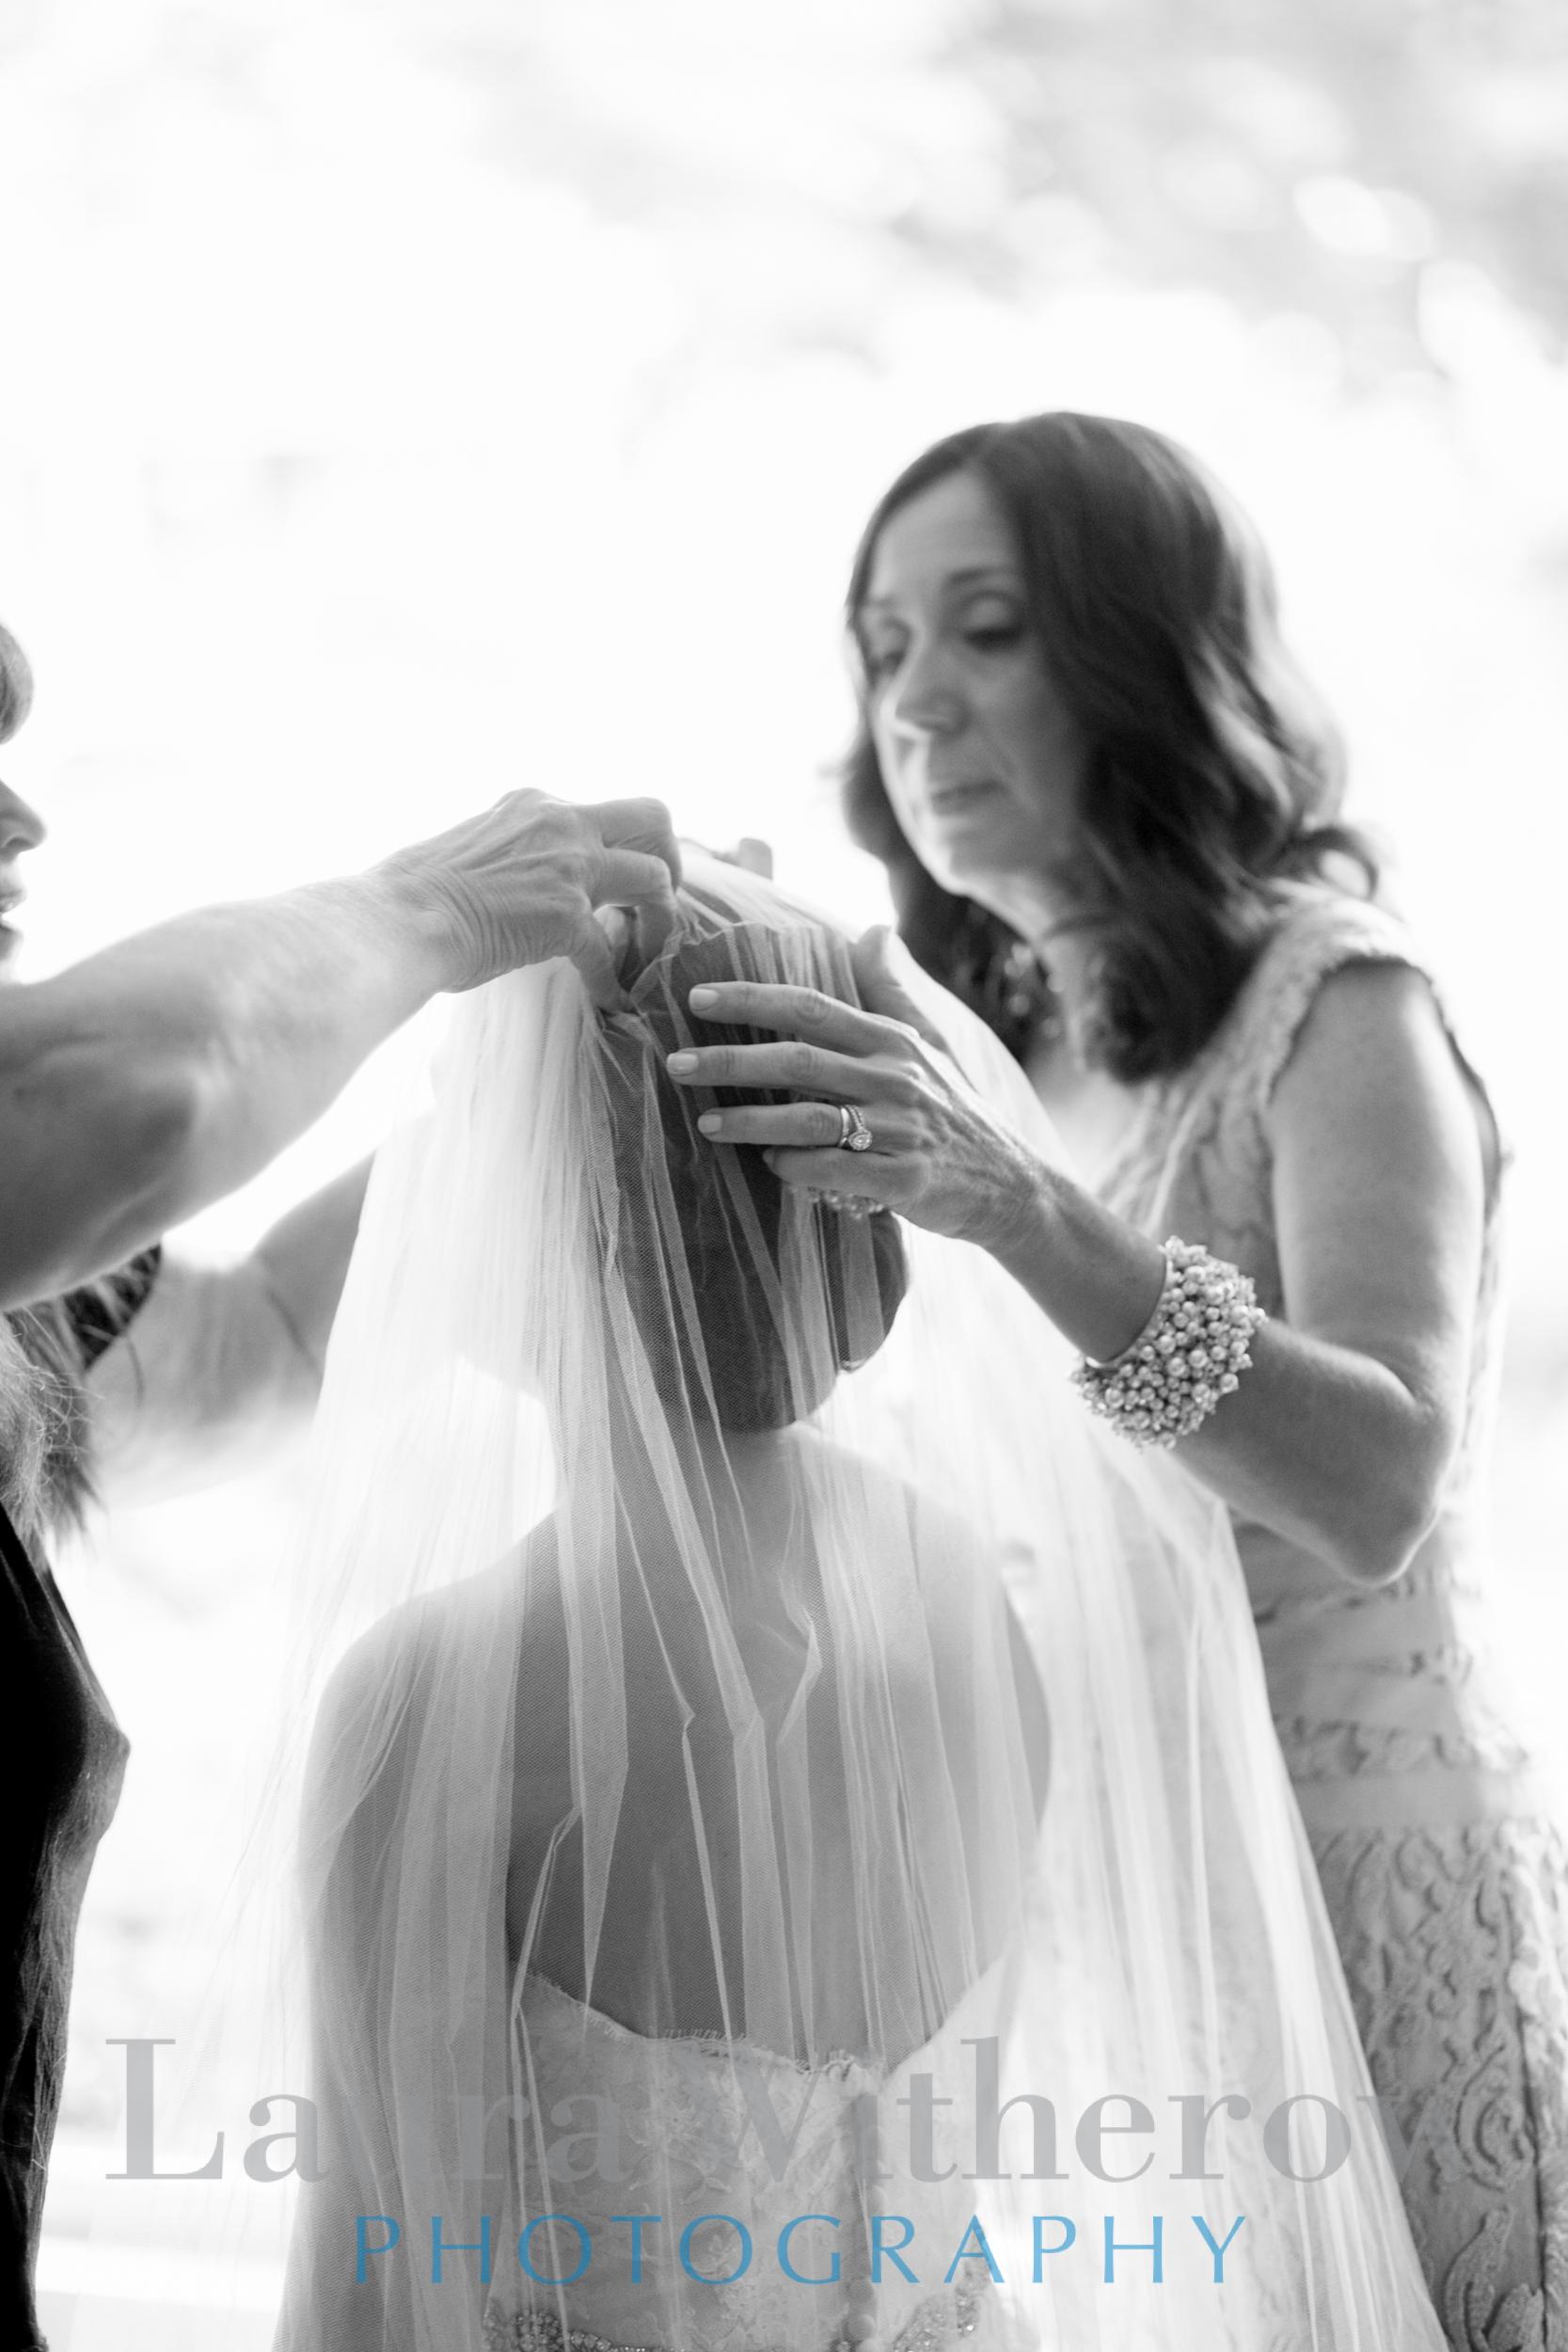 glenview-photographer-weddings.jpg